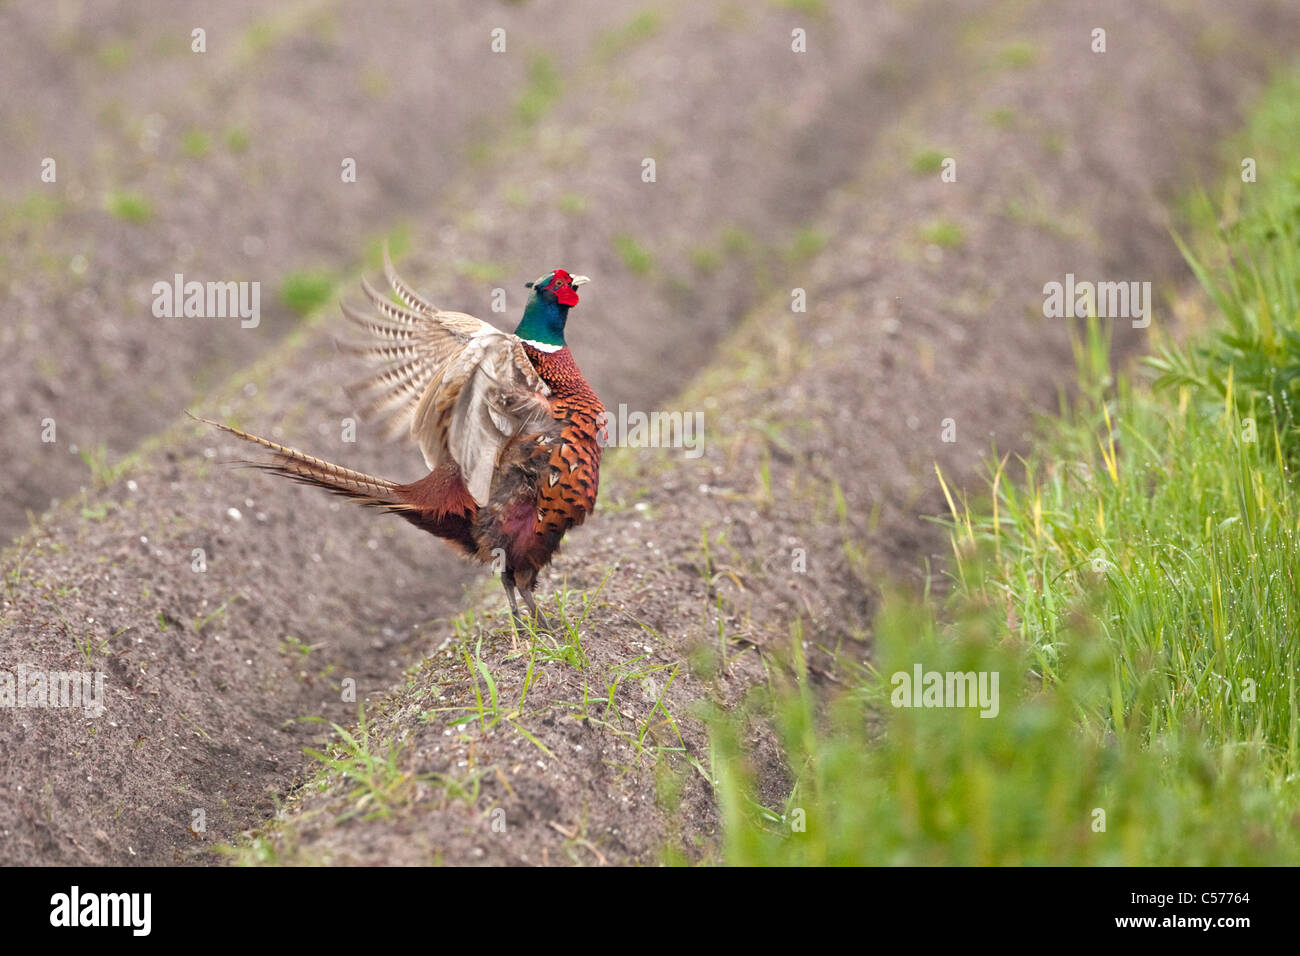 The Netherlands, Blankenham, Male pheasant. Phasianus colchicus. Stock Photo